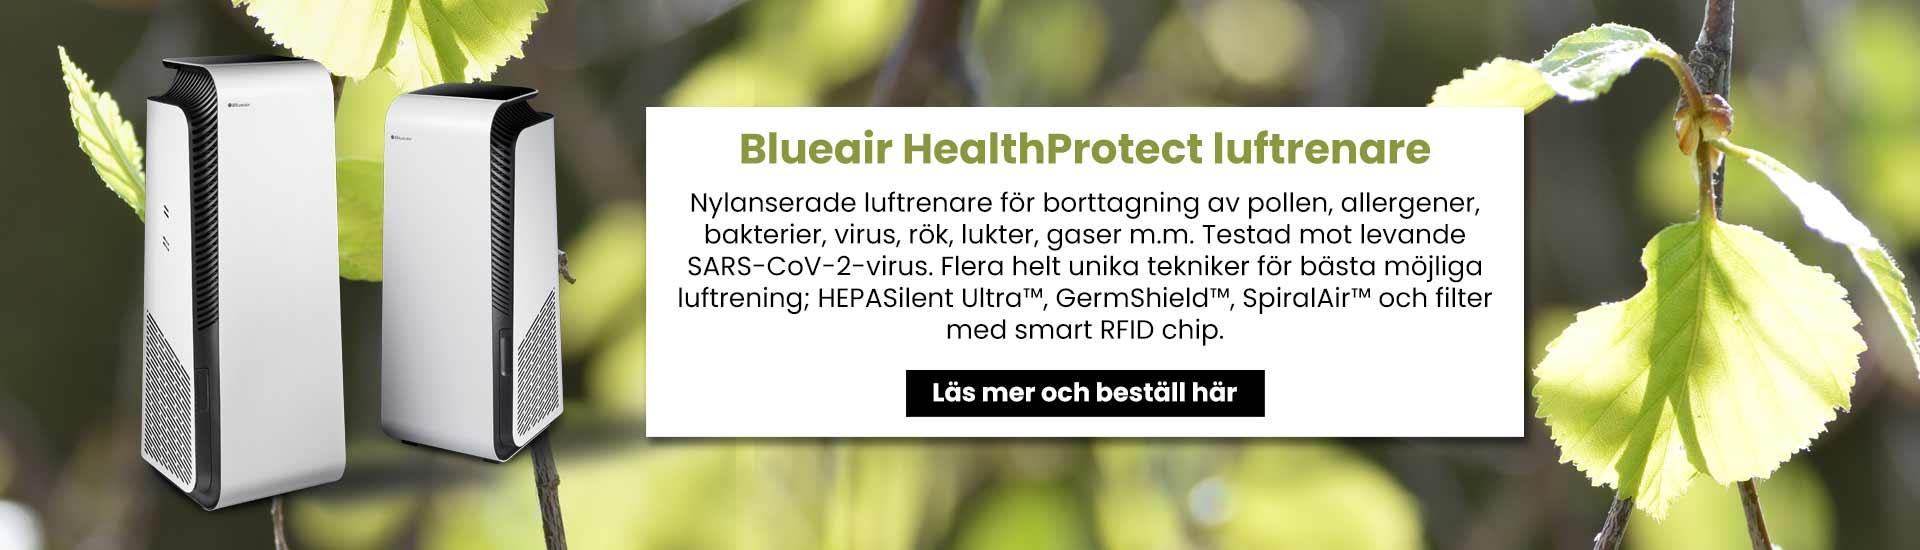 https://www.luftrenare.se/image/3133/healthProSpring21.jpg